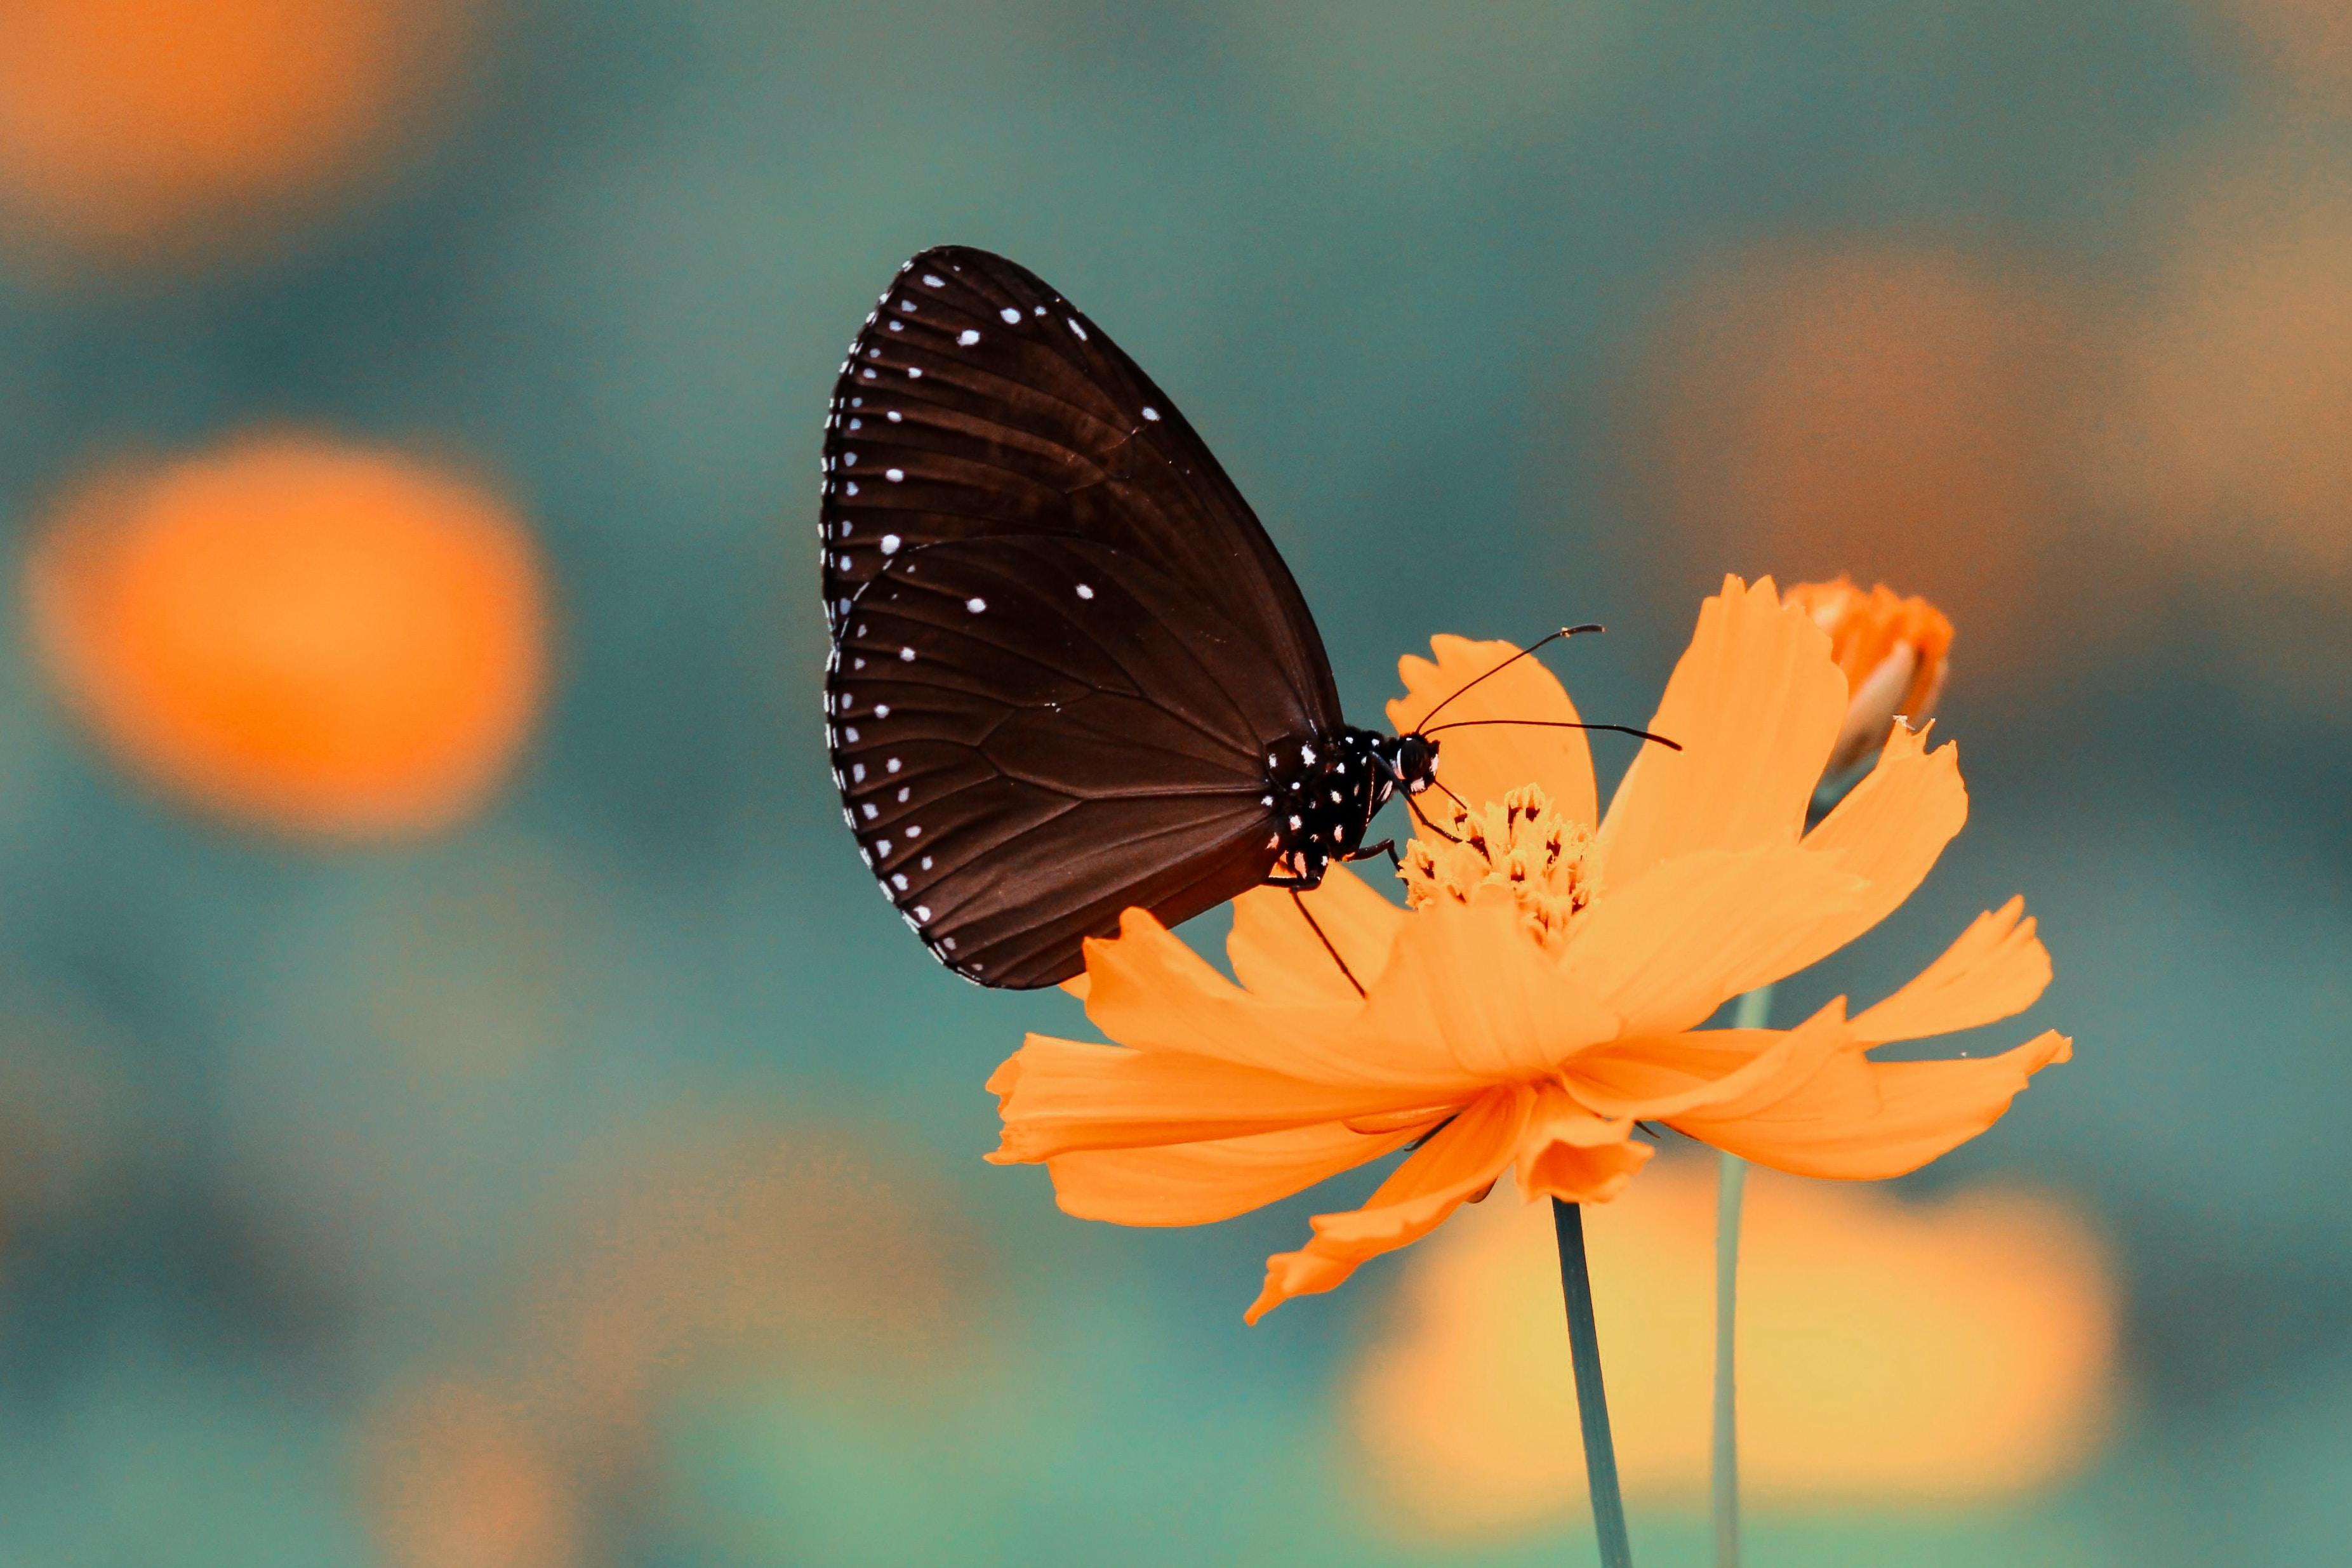 A black butterfly on a bright orange flower